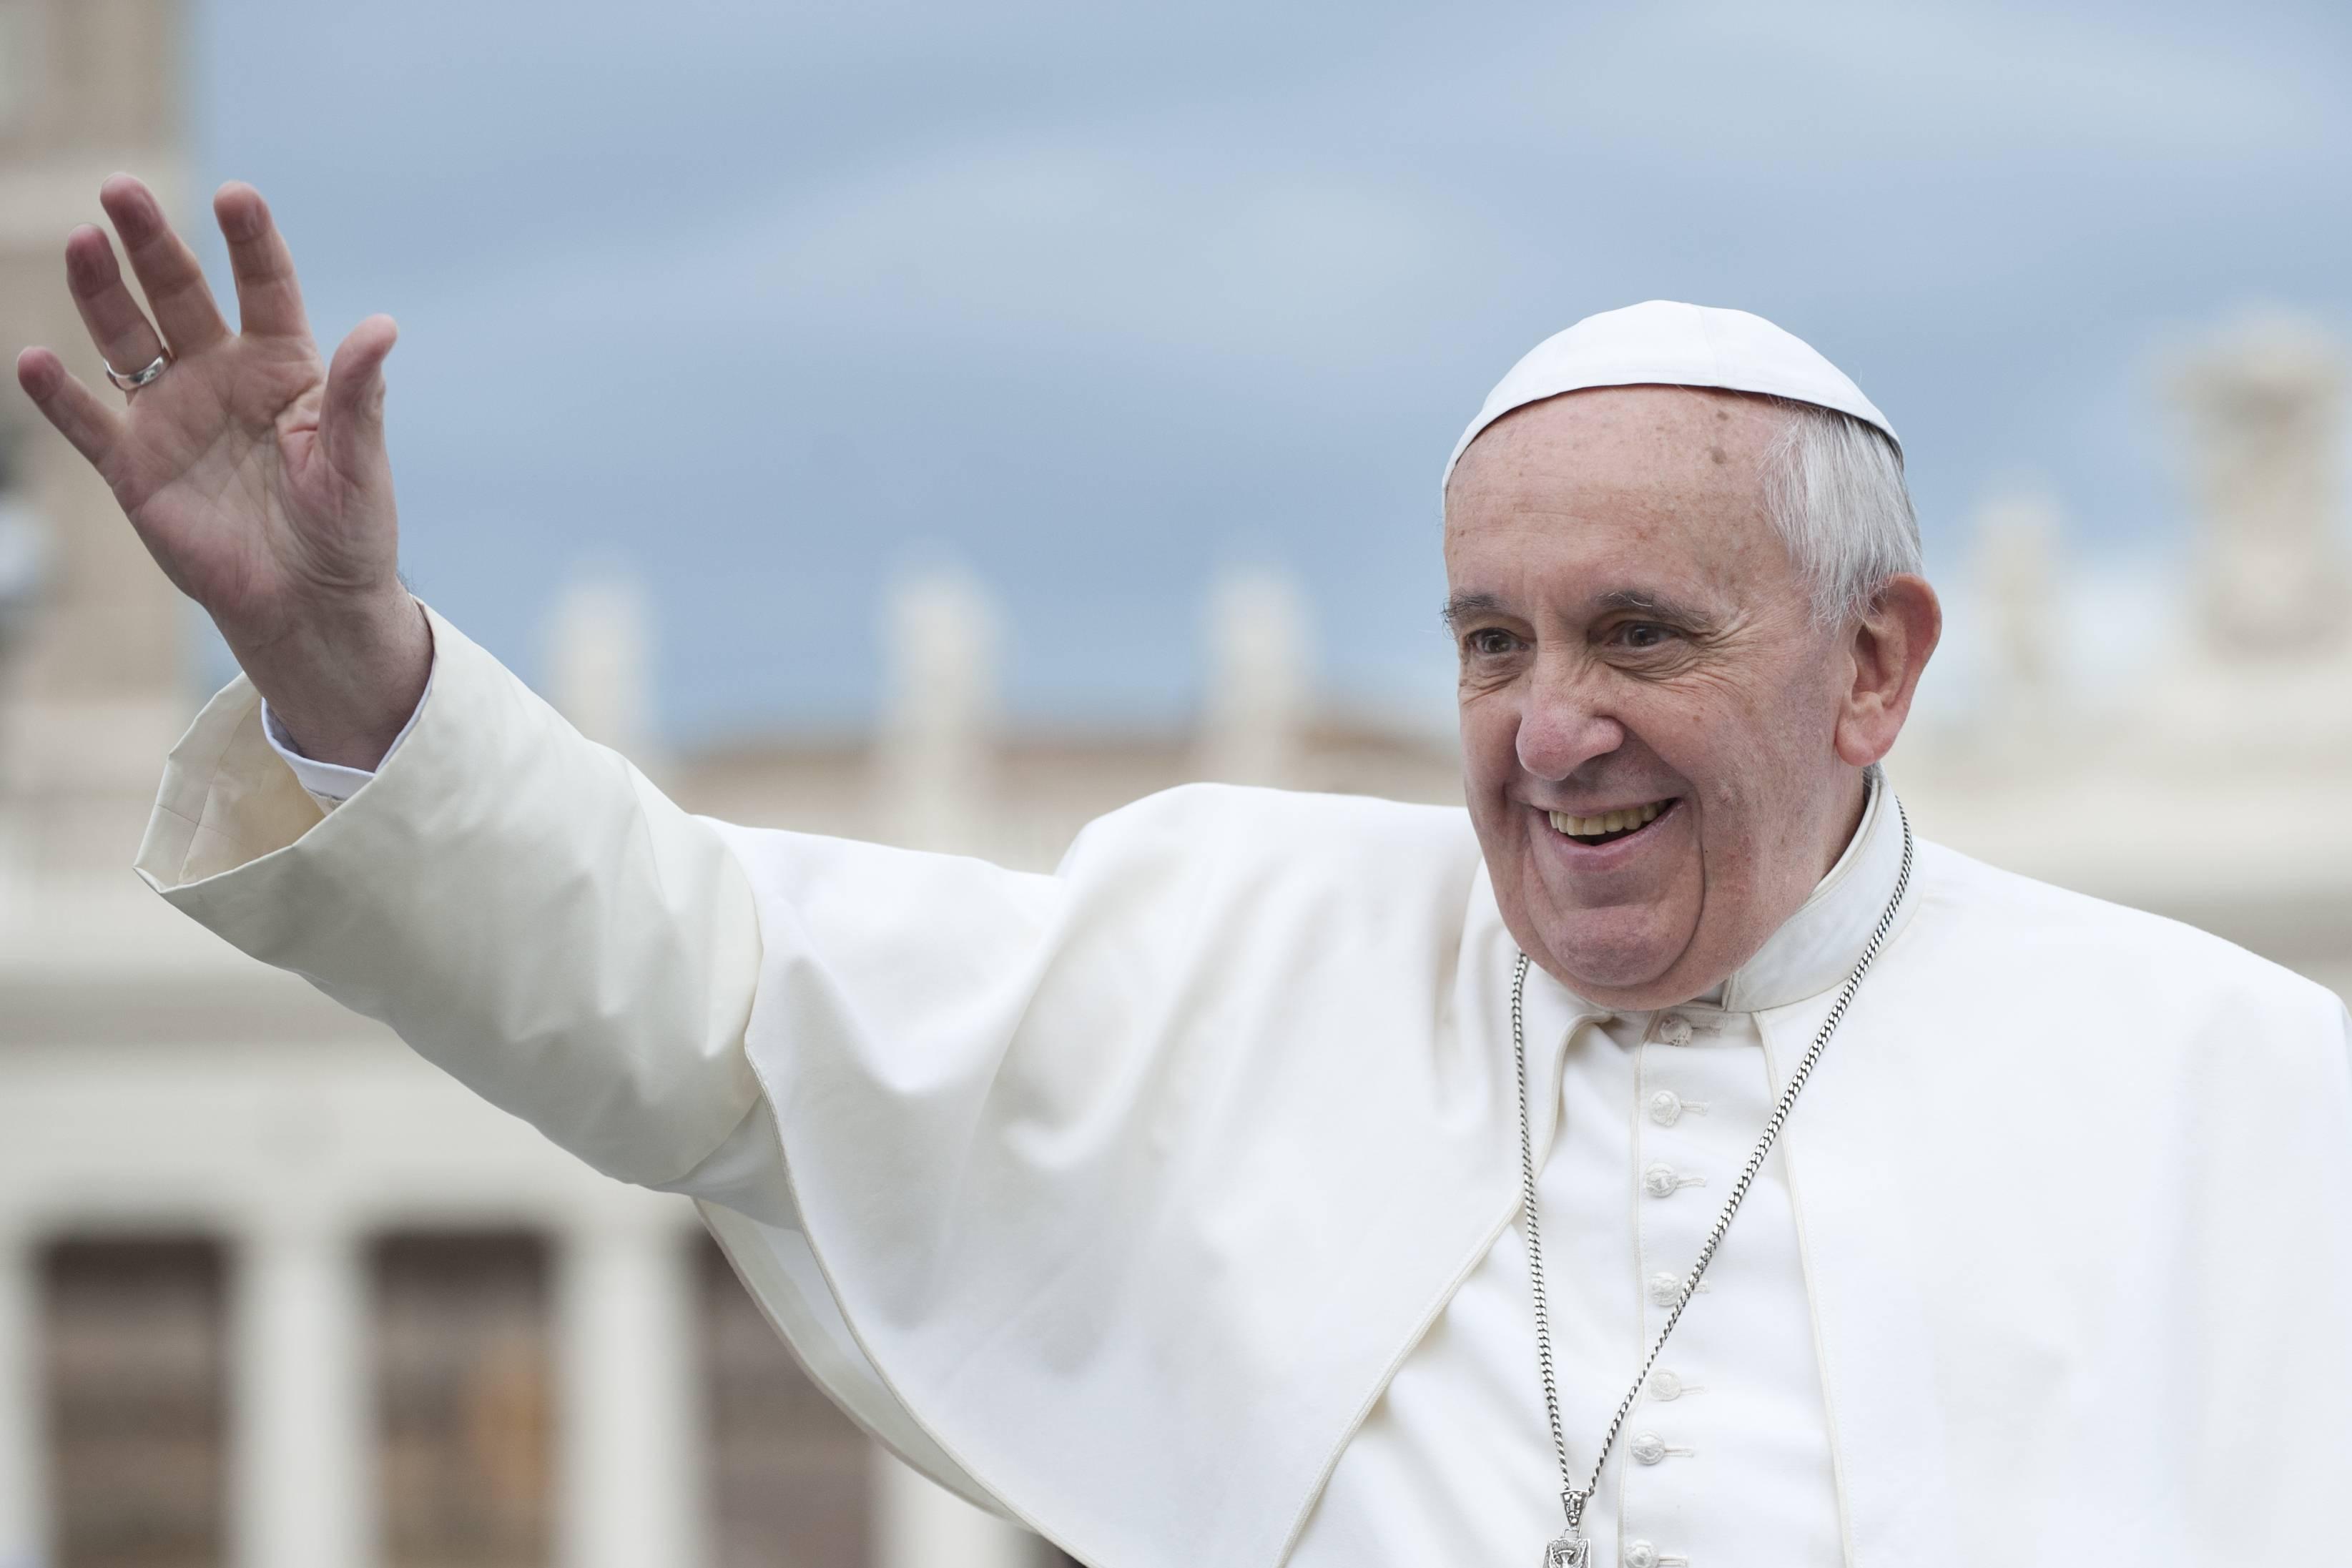 Bari si prepara a ricevere Papa Francesco